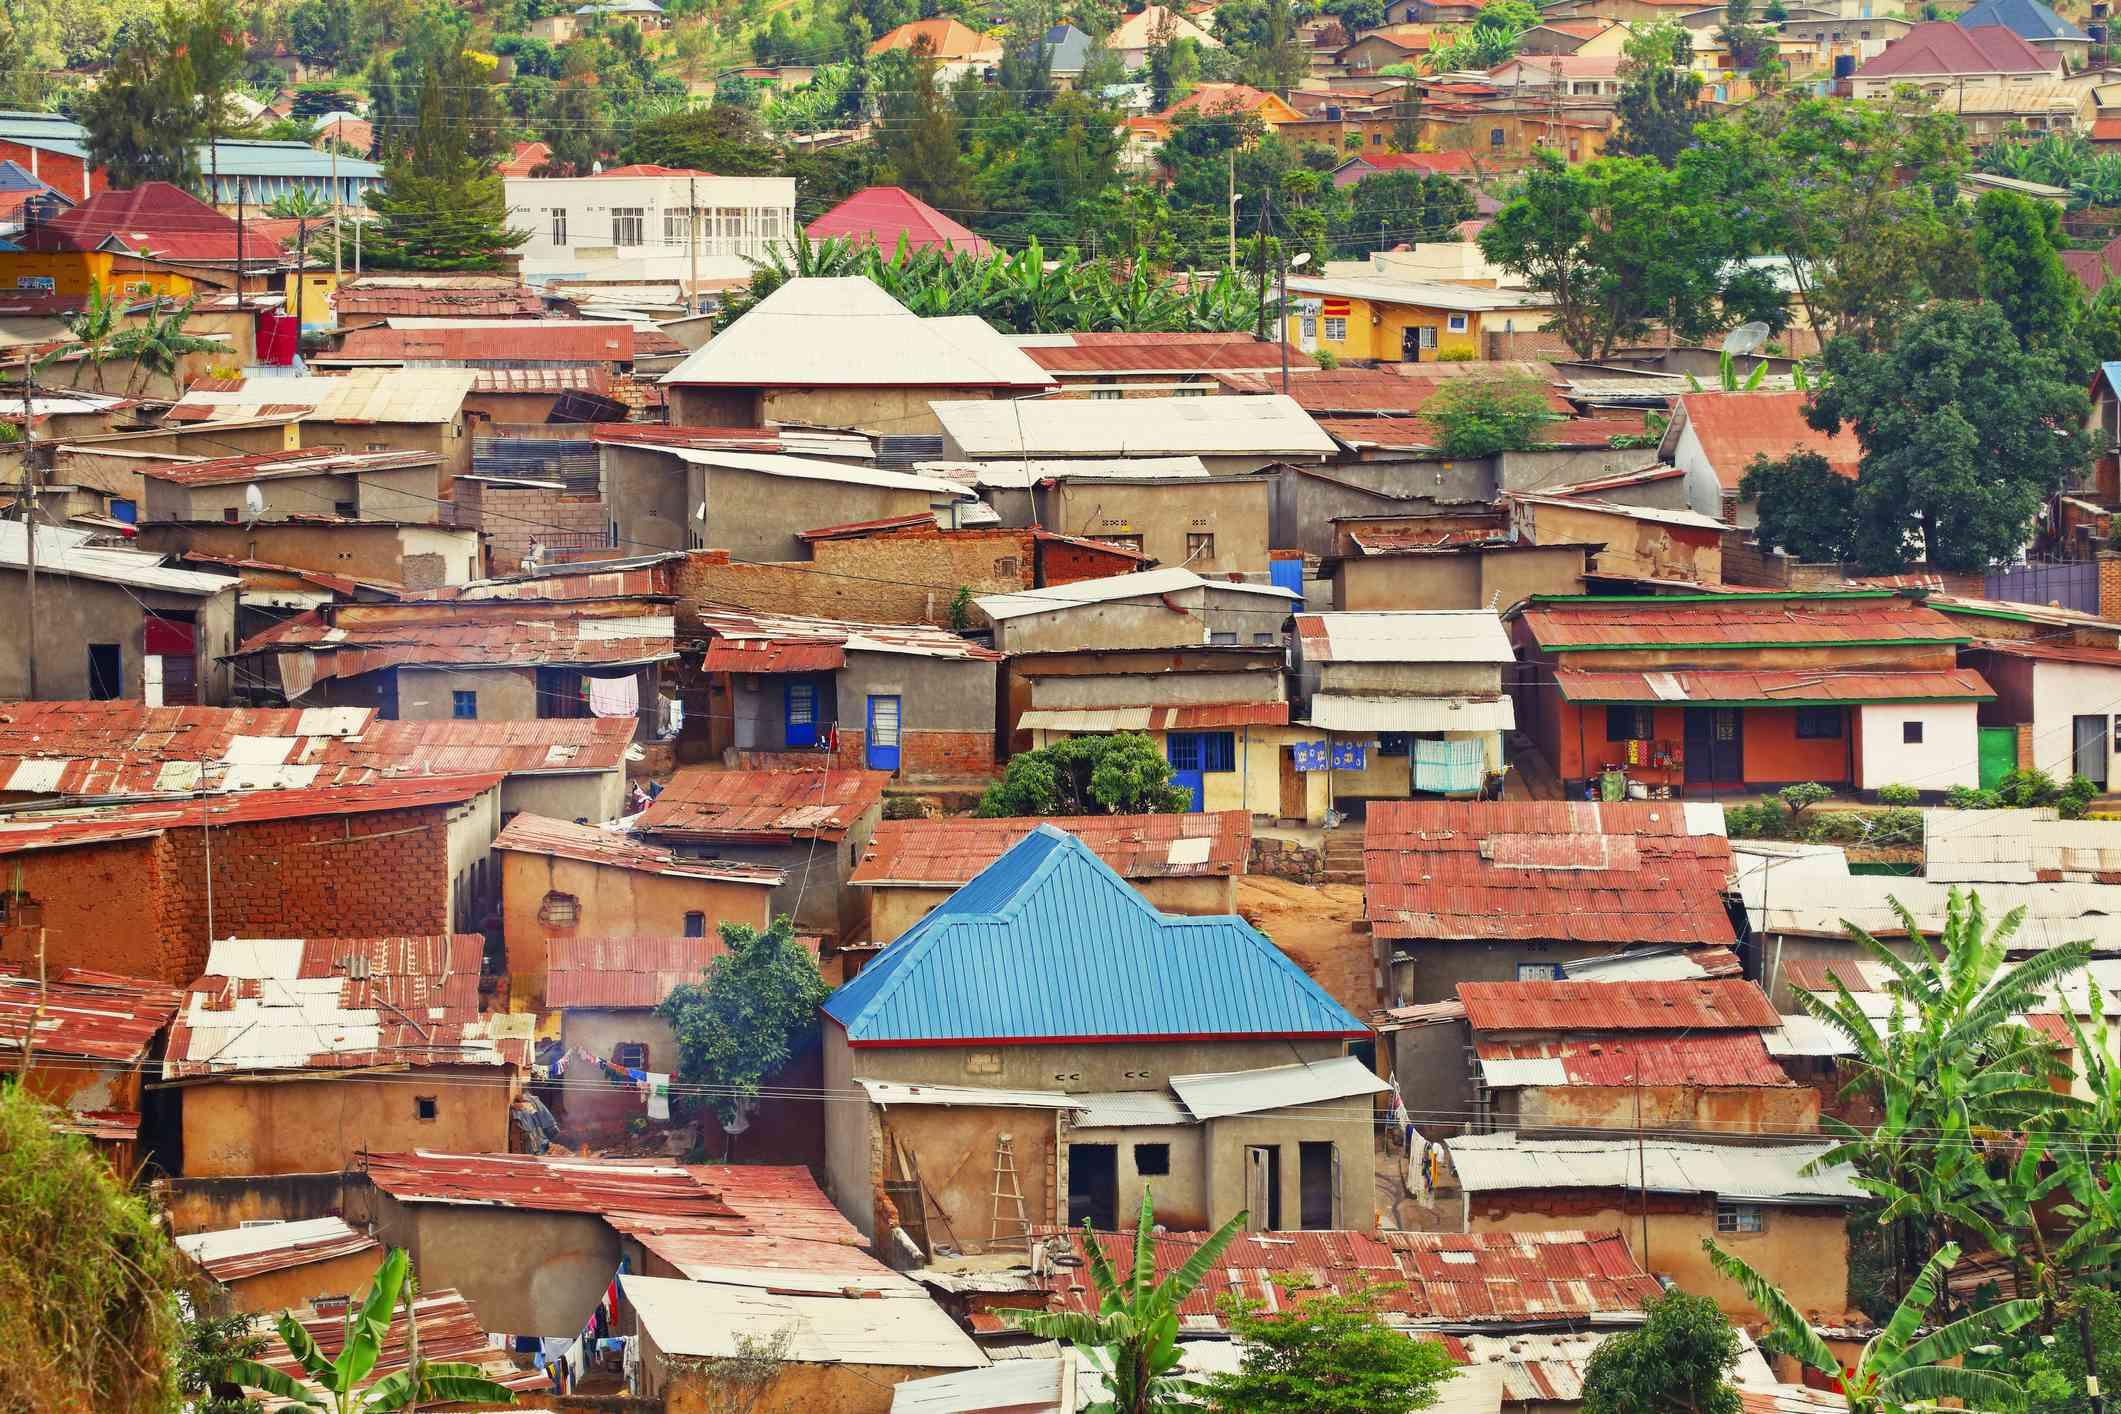 Informal settlement in Kigali, Rwanda